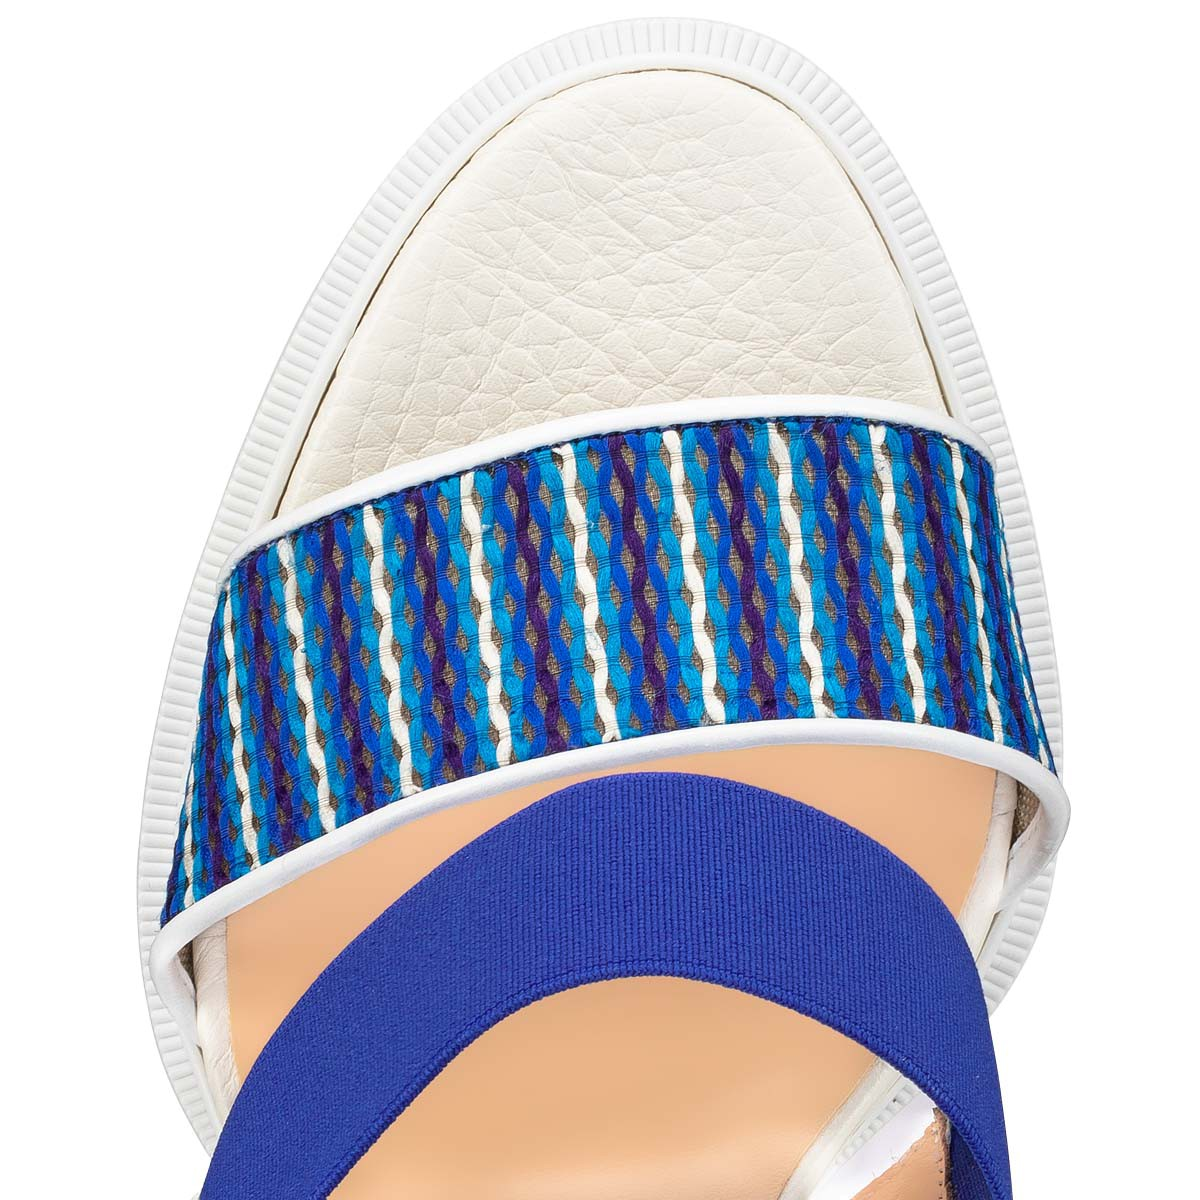 Shoes - Patrouiagoma - Christian Louboutin